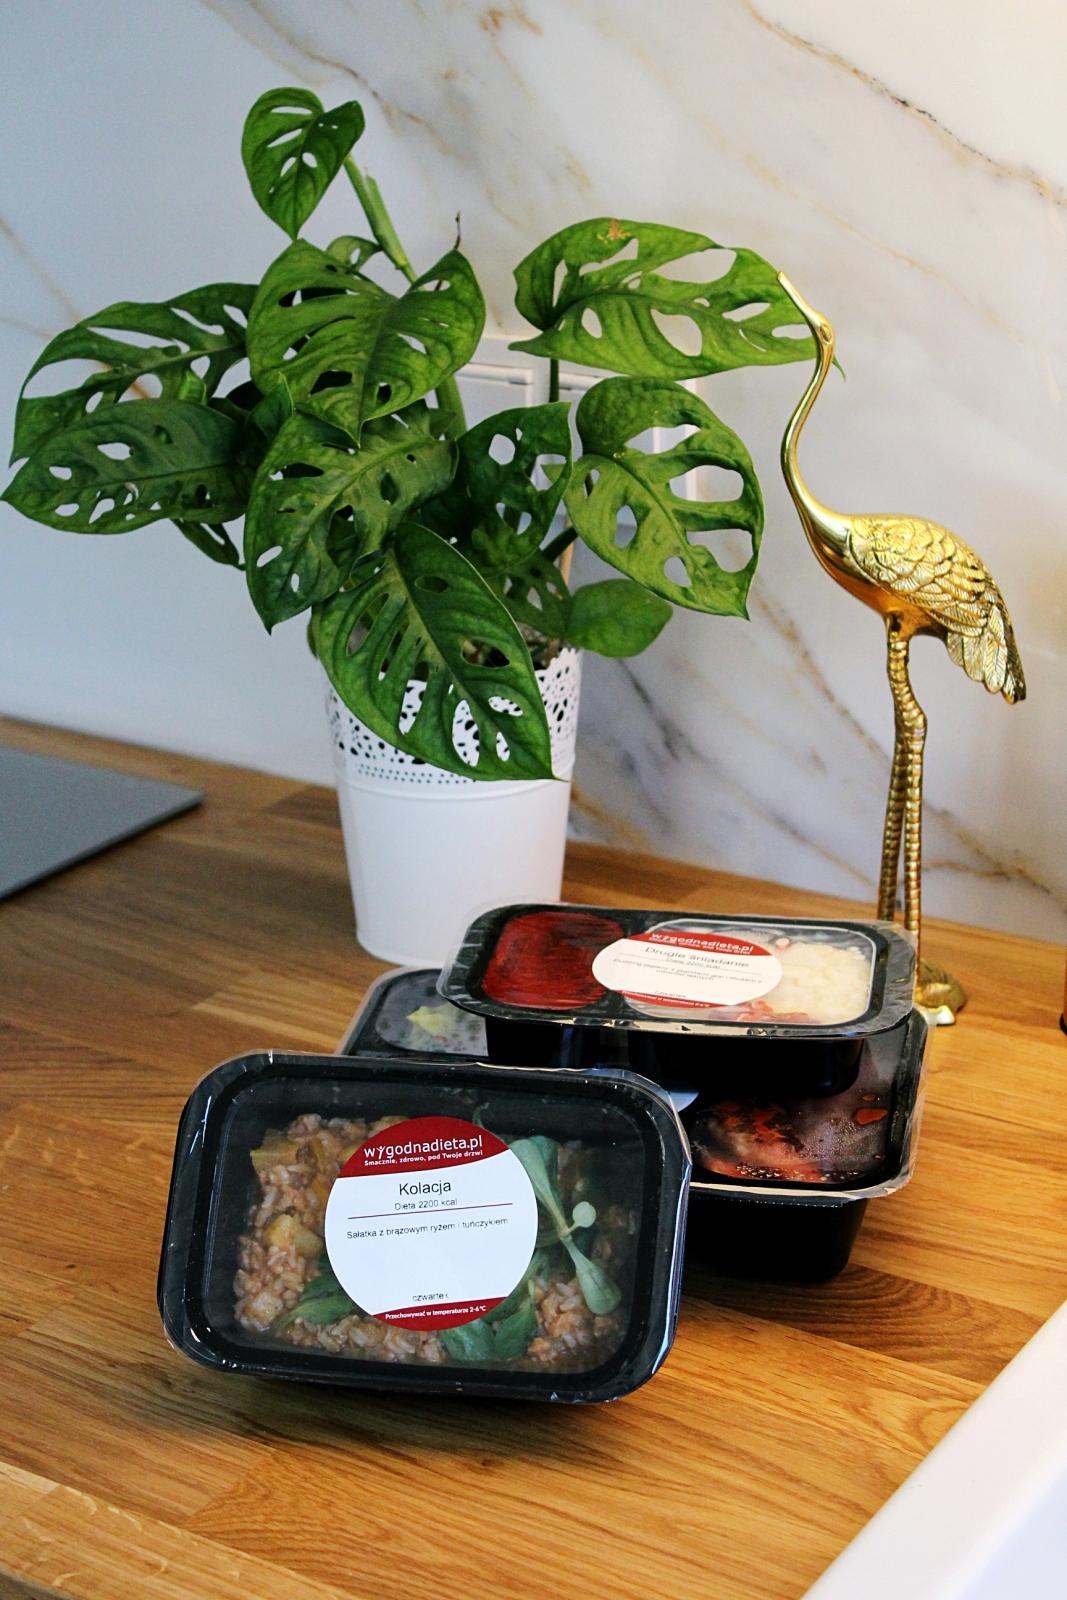 catering wygodna dieta blog